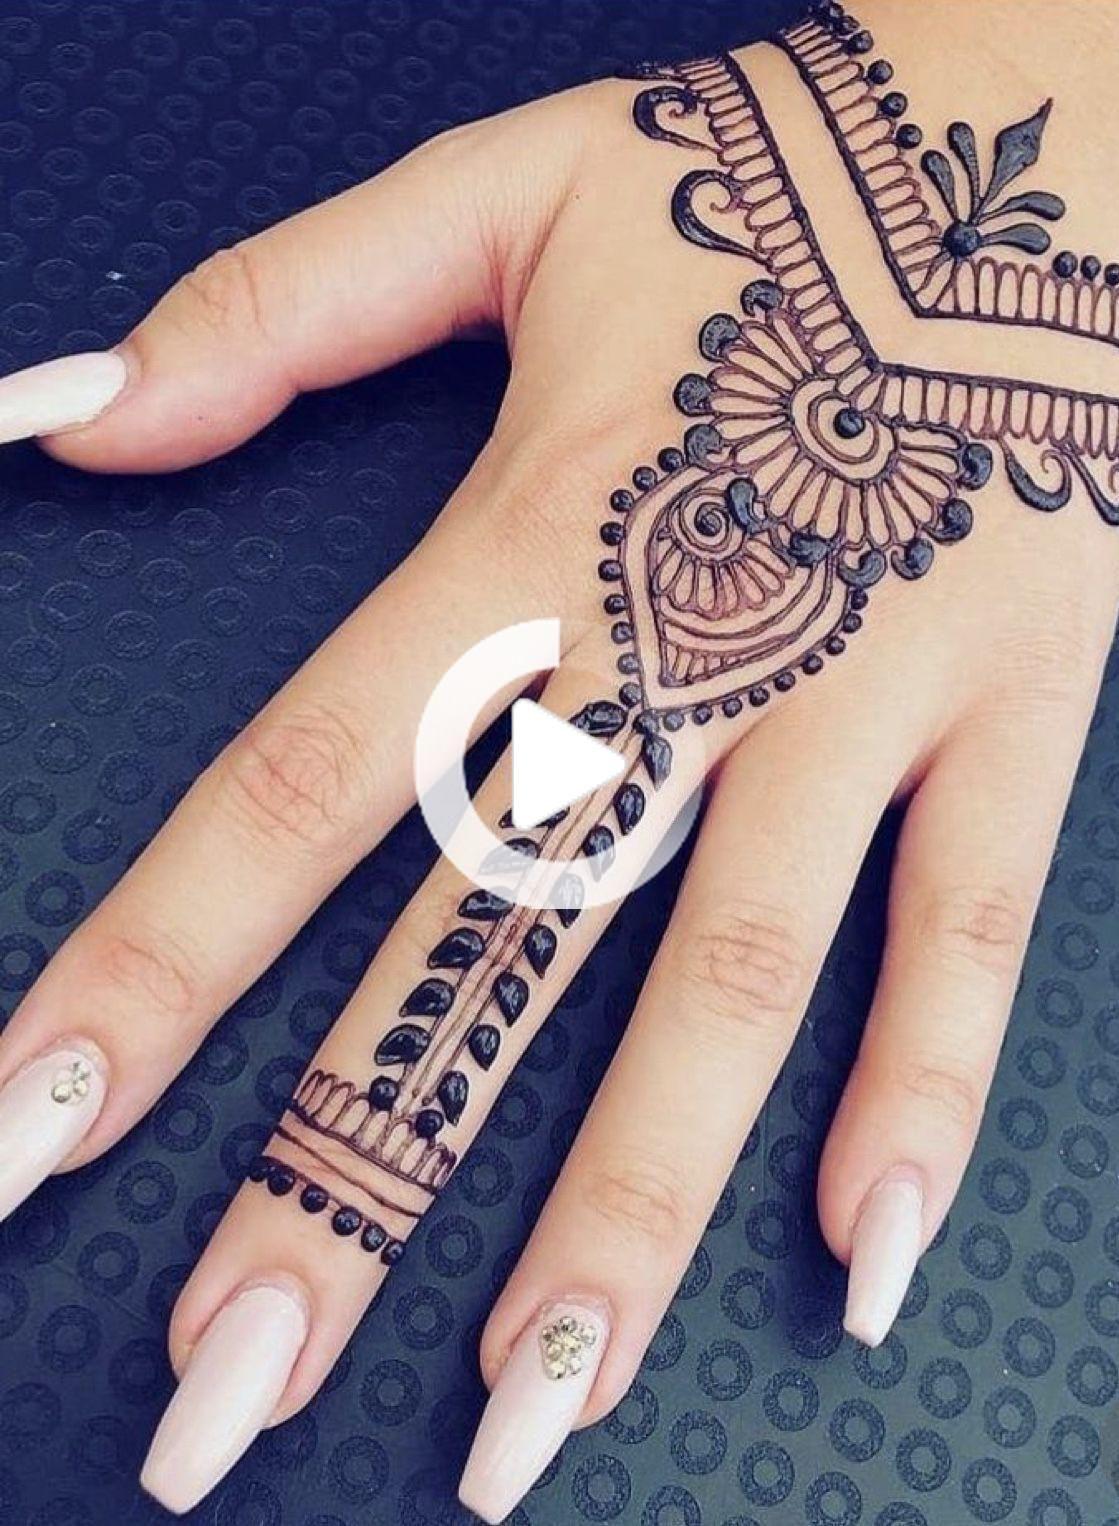 Diseno De Henna Para Todos In 2020 Henna Tattoo Hand Henna Tattoo Designs Simple Cute Henna Tattoos